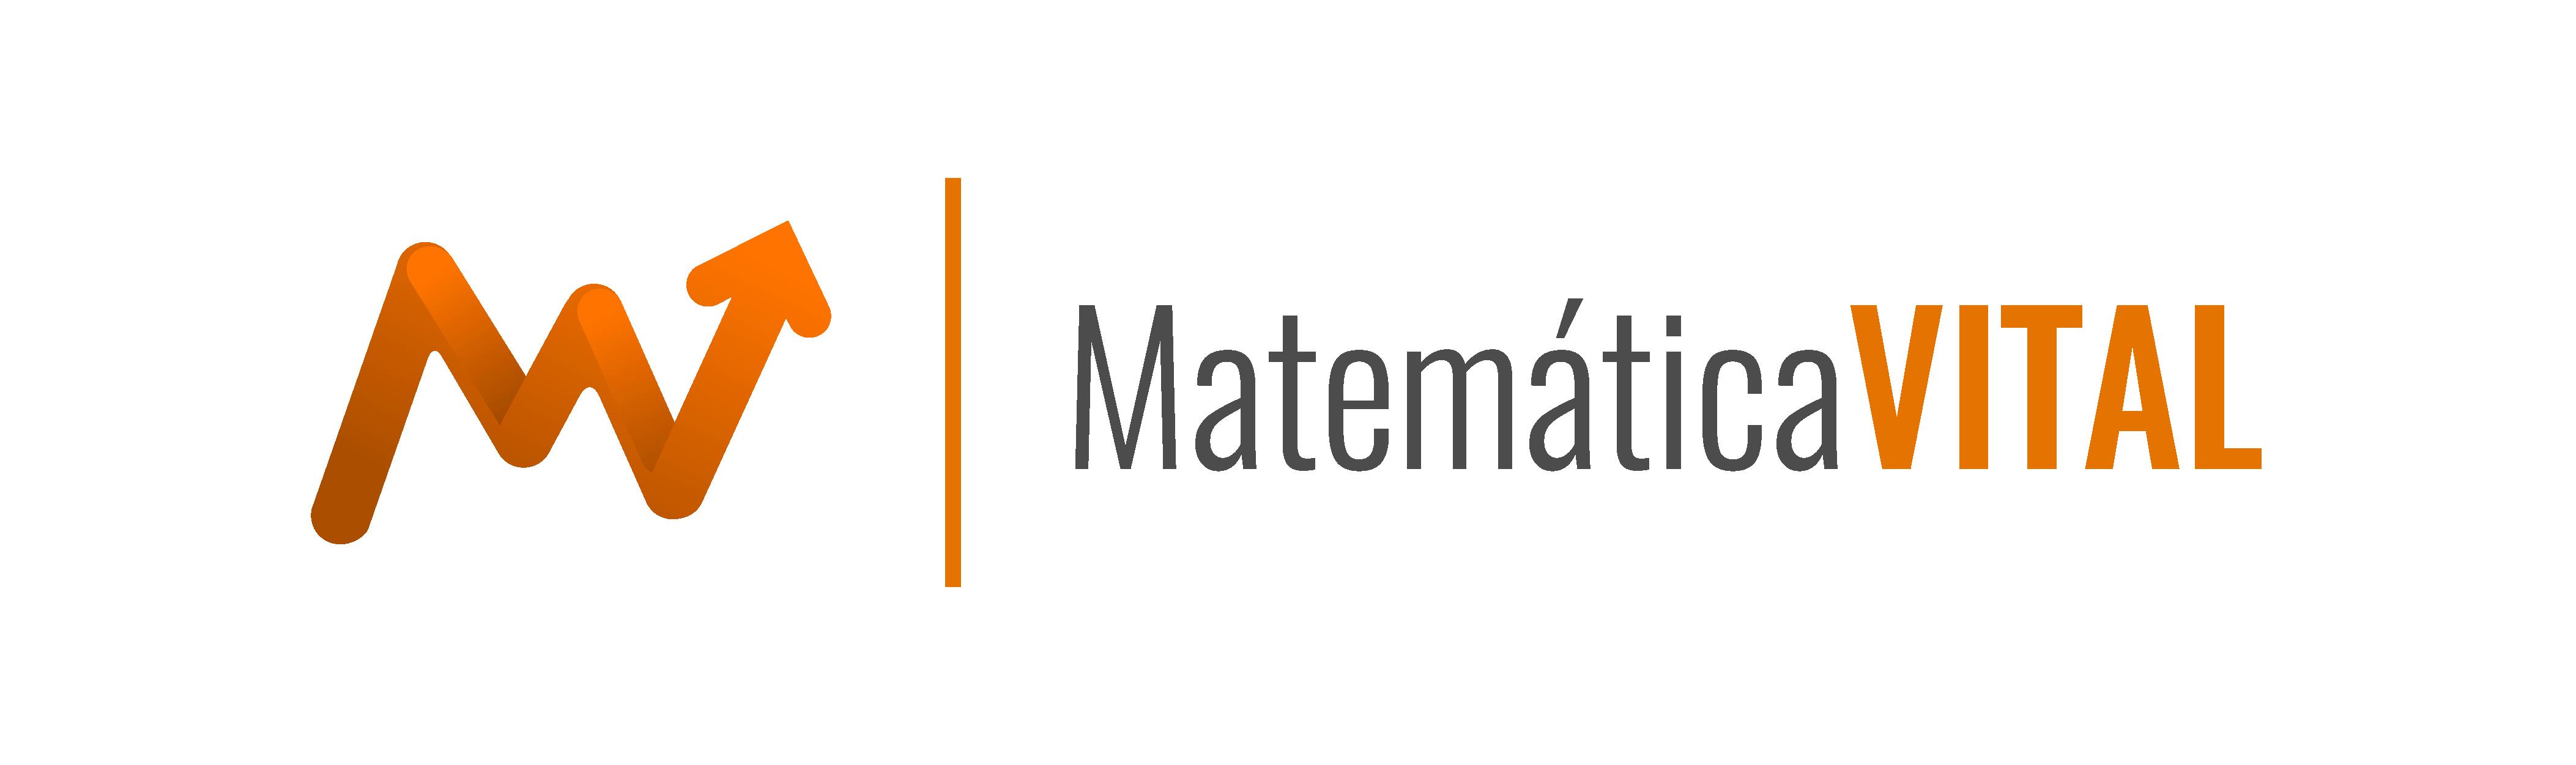 Matematica Vital